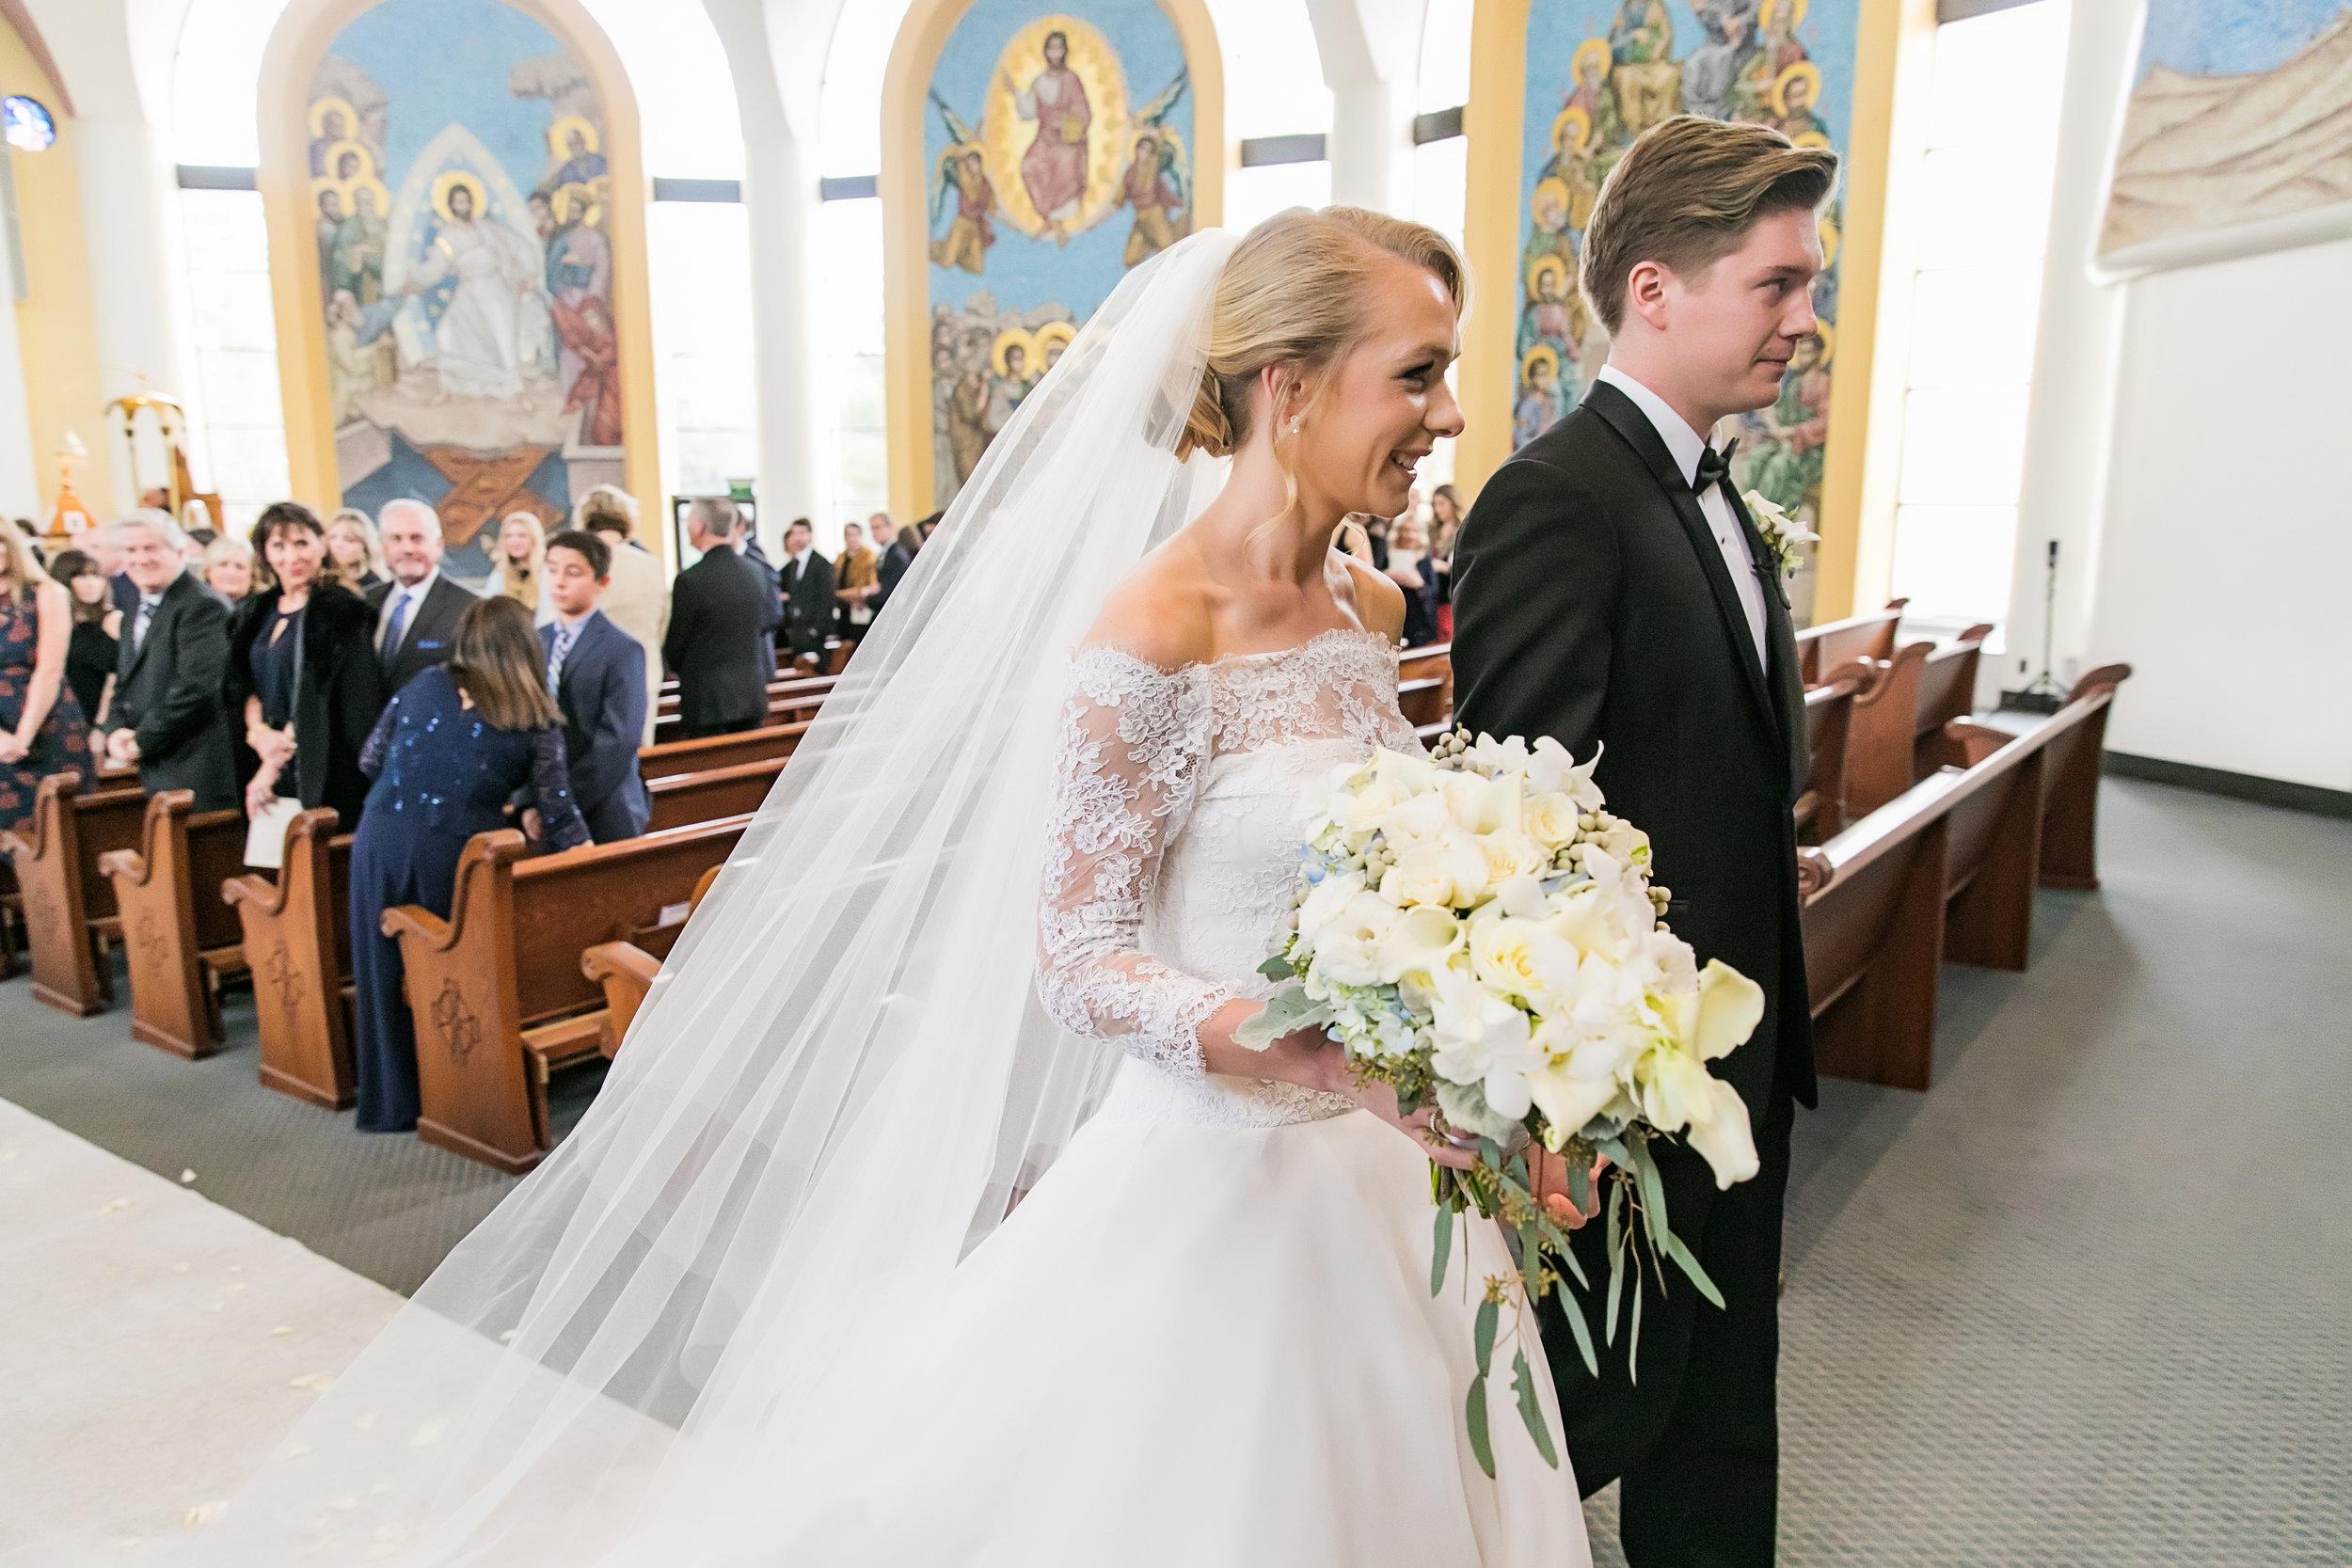 Biltmore Ballrooms Atlanta Wedding Planner Slauer Events Ceremony 55.jpg